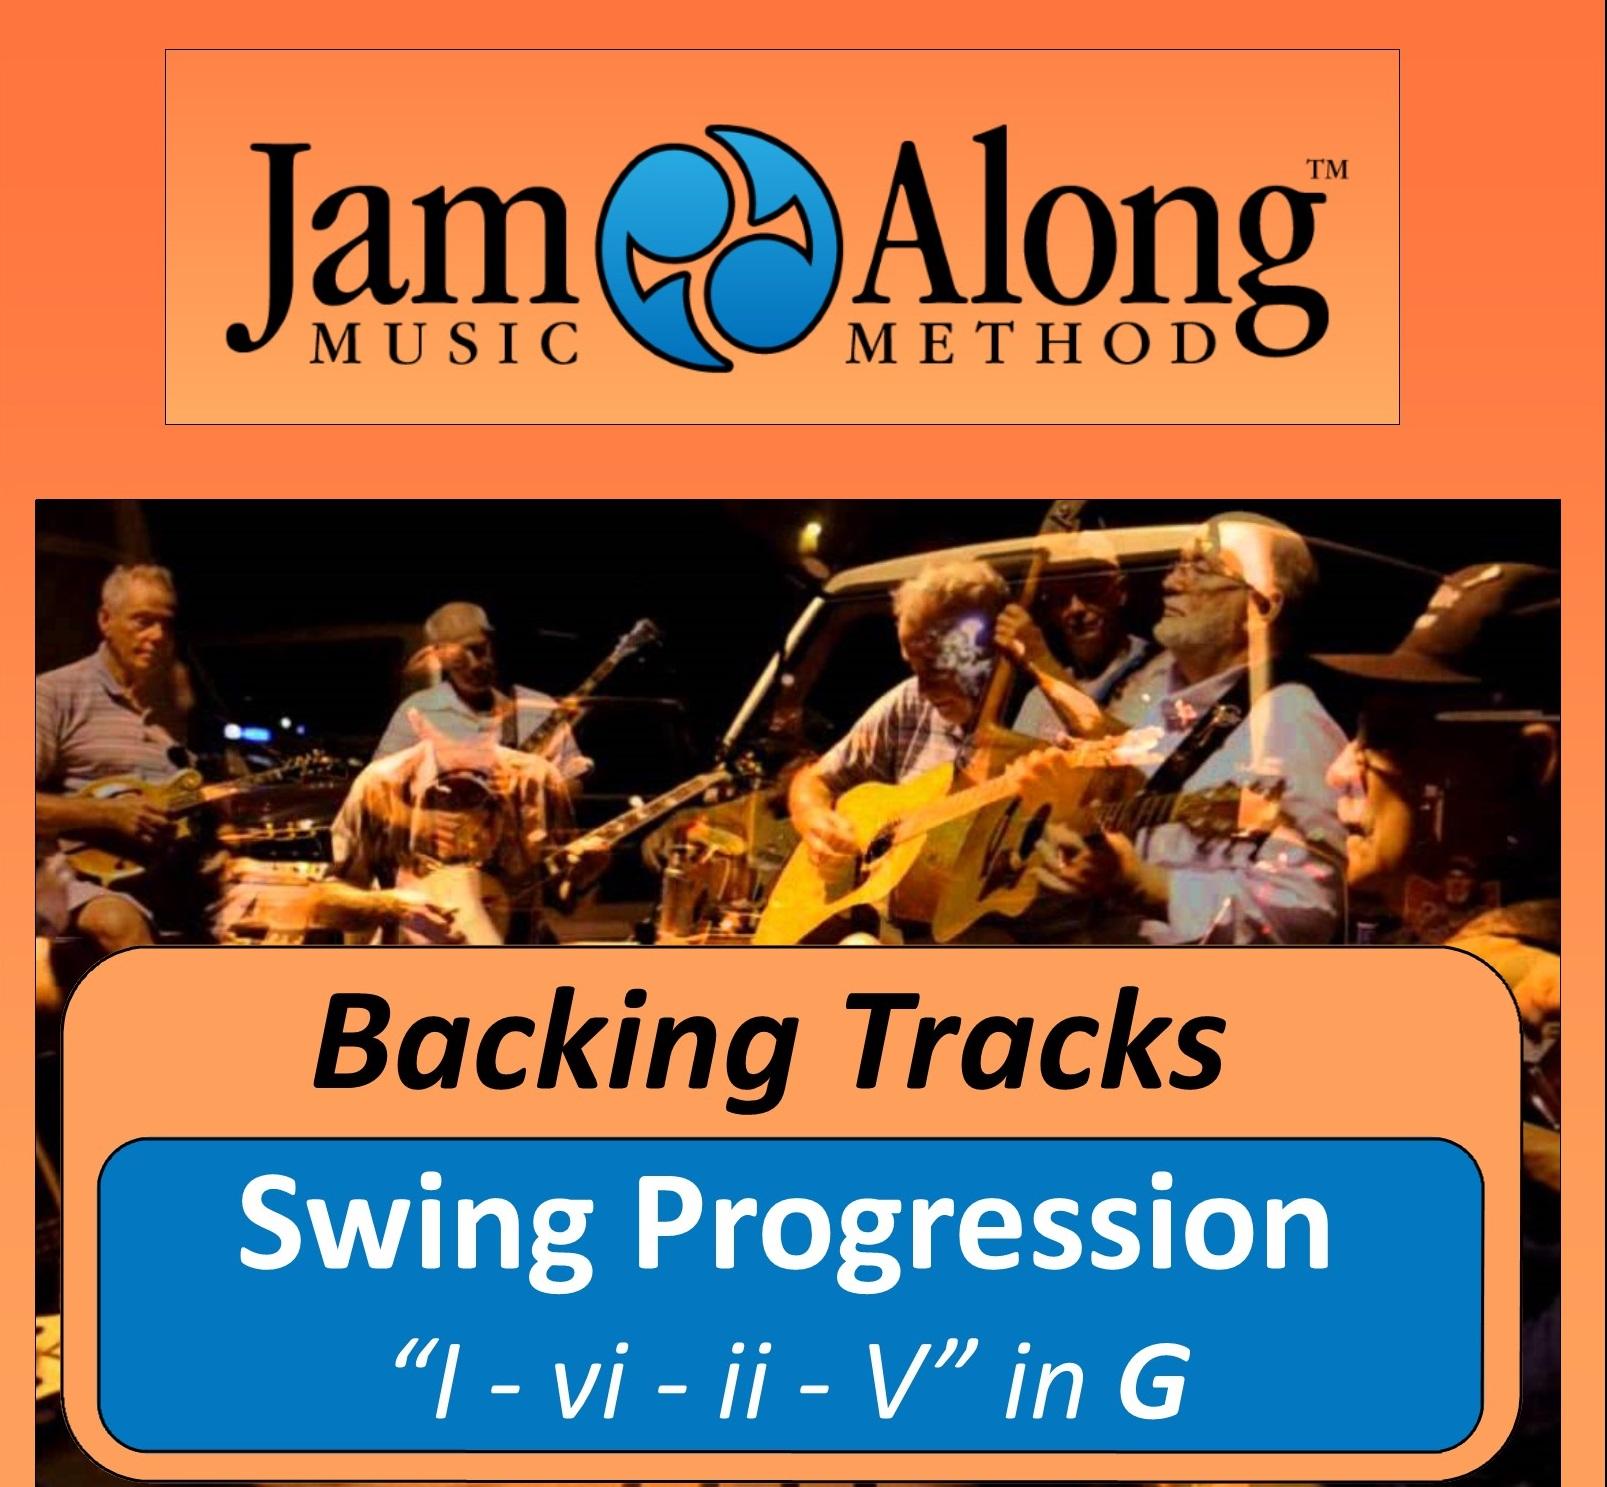 Swing Progression (I - vi - ii - V) - Backing Tracks